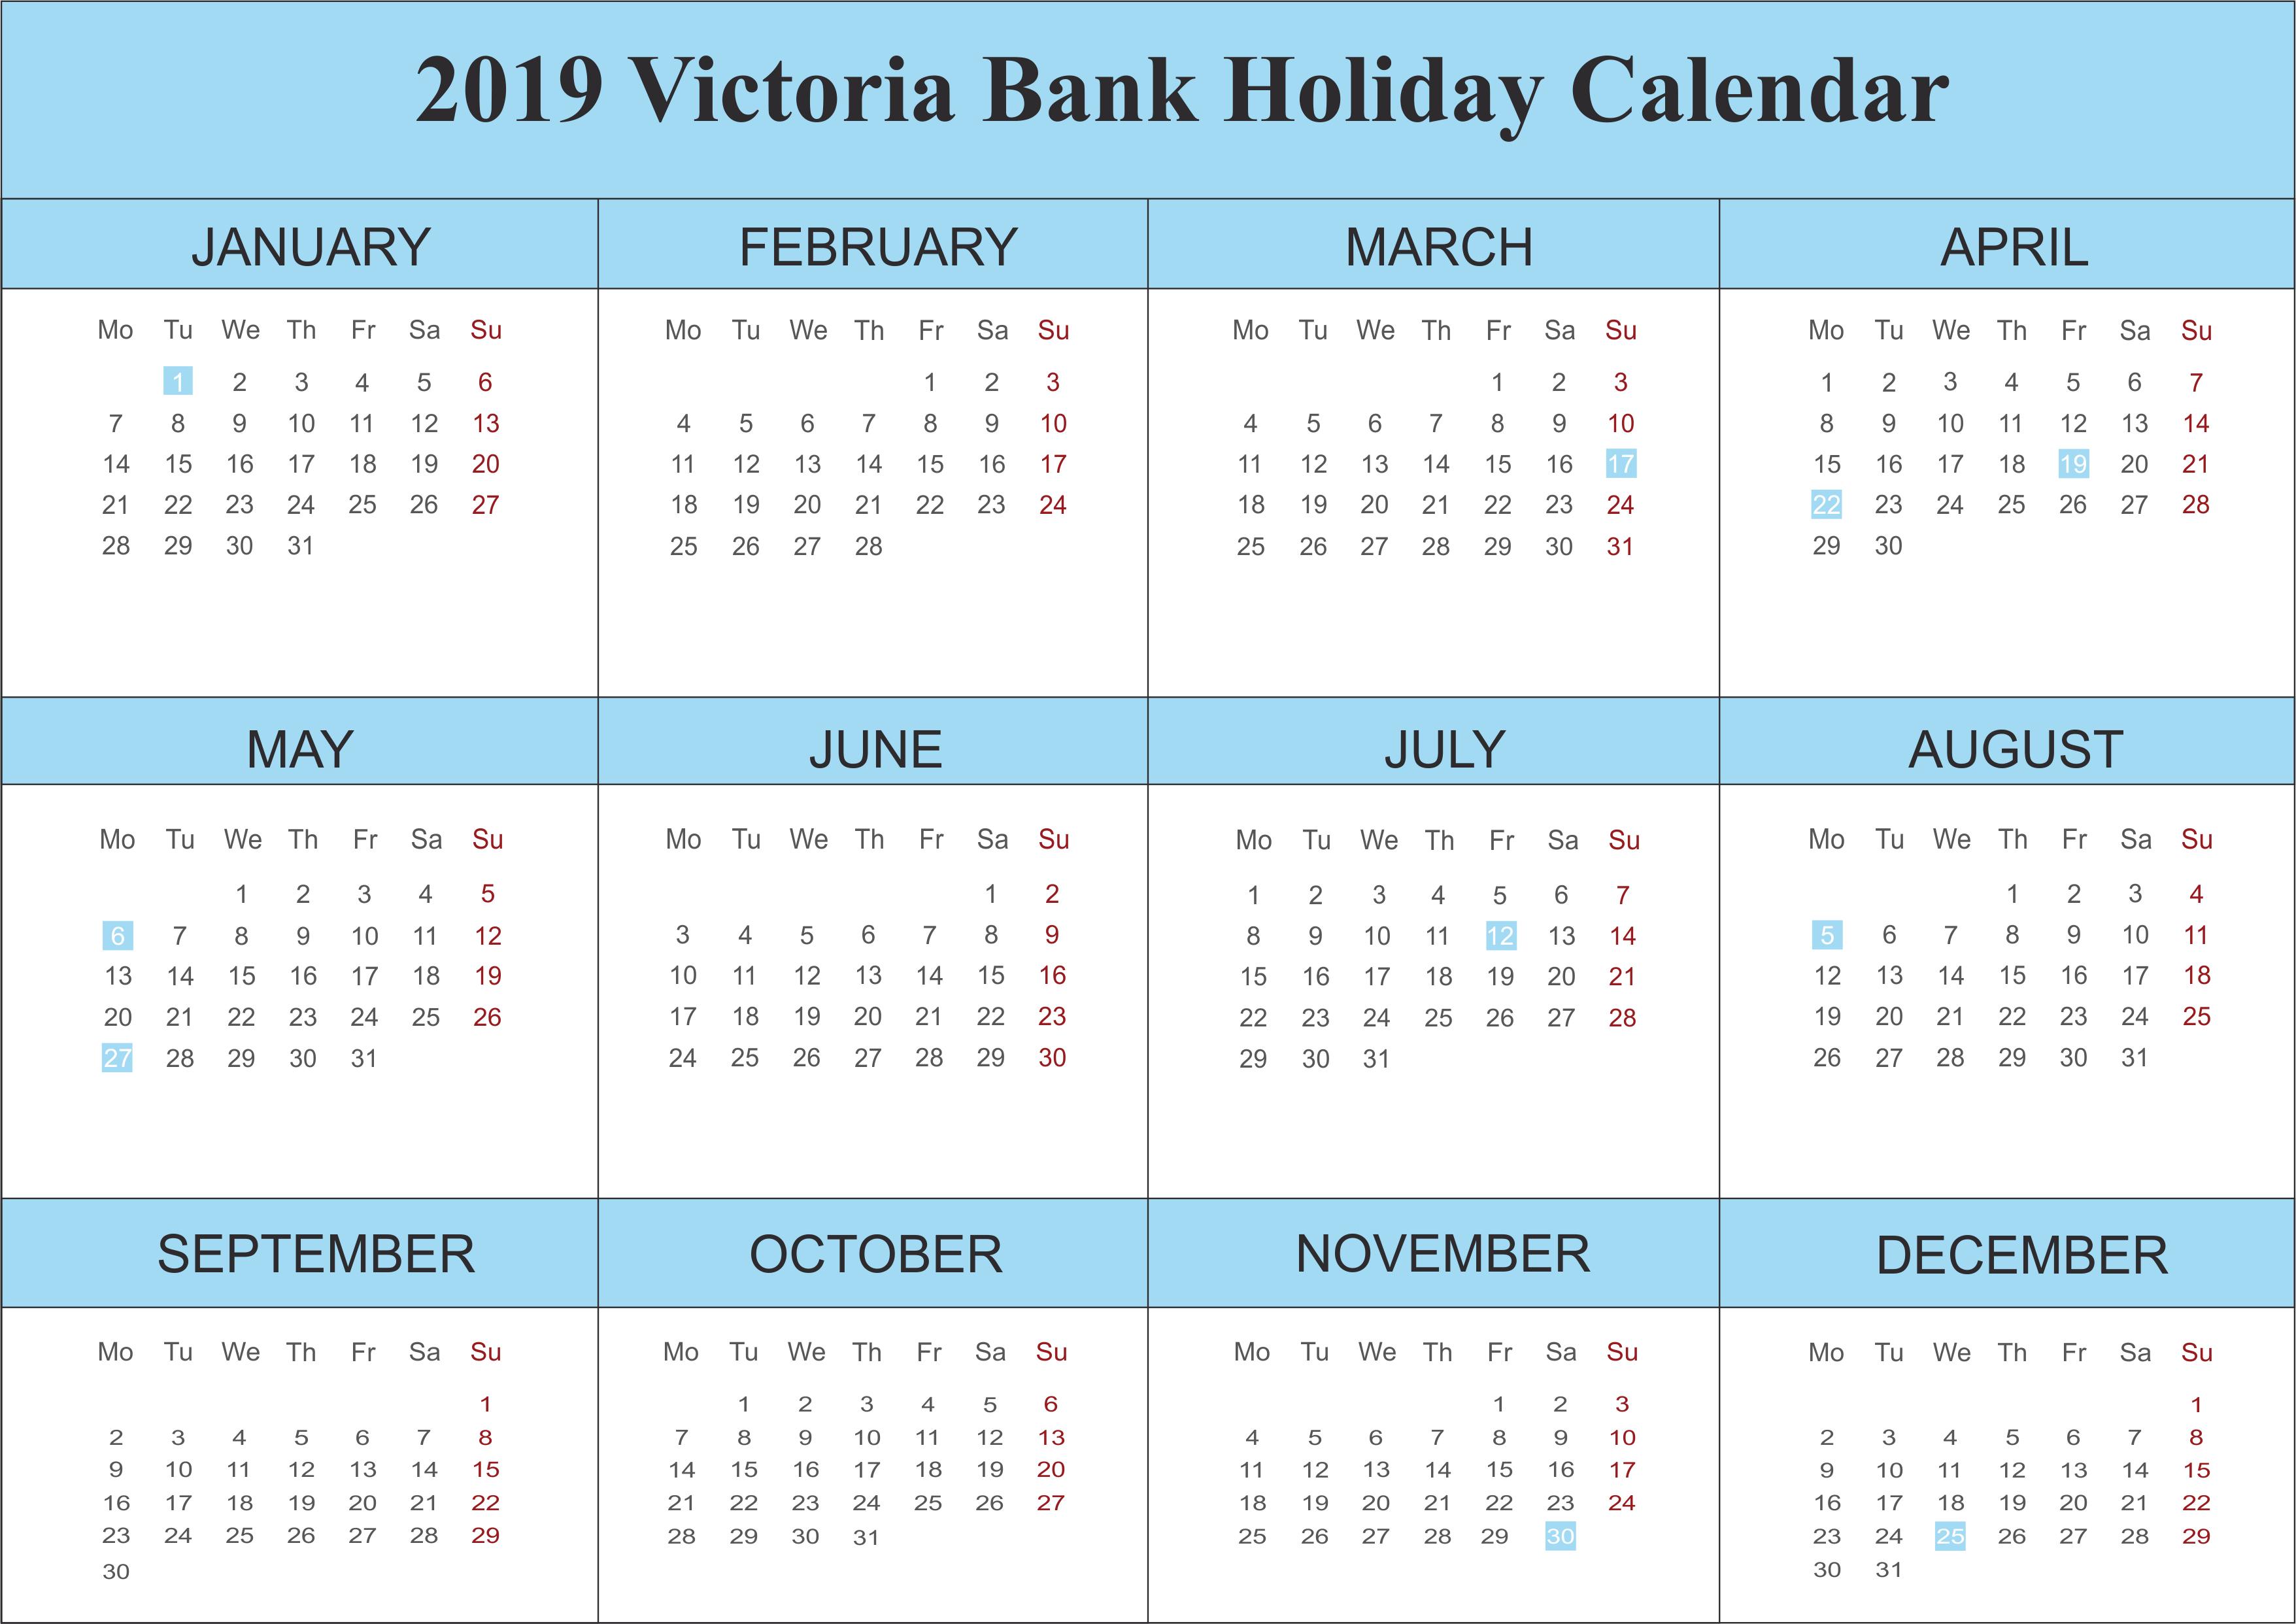 2019 Victoria Blank Holidays Calendar Template - Free Printable Calendar 2019 Victoria